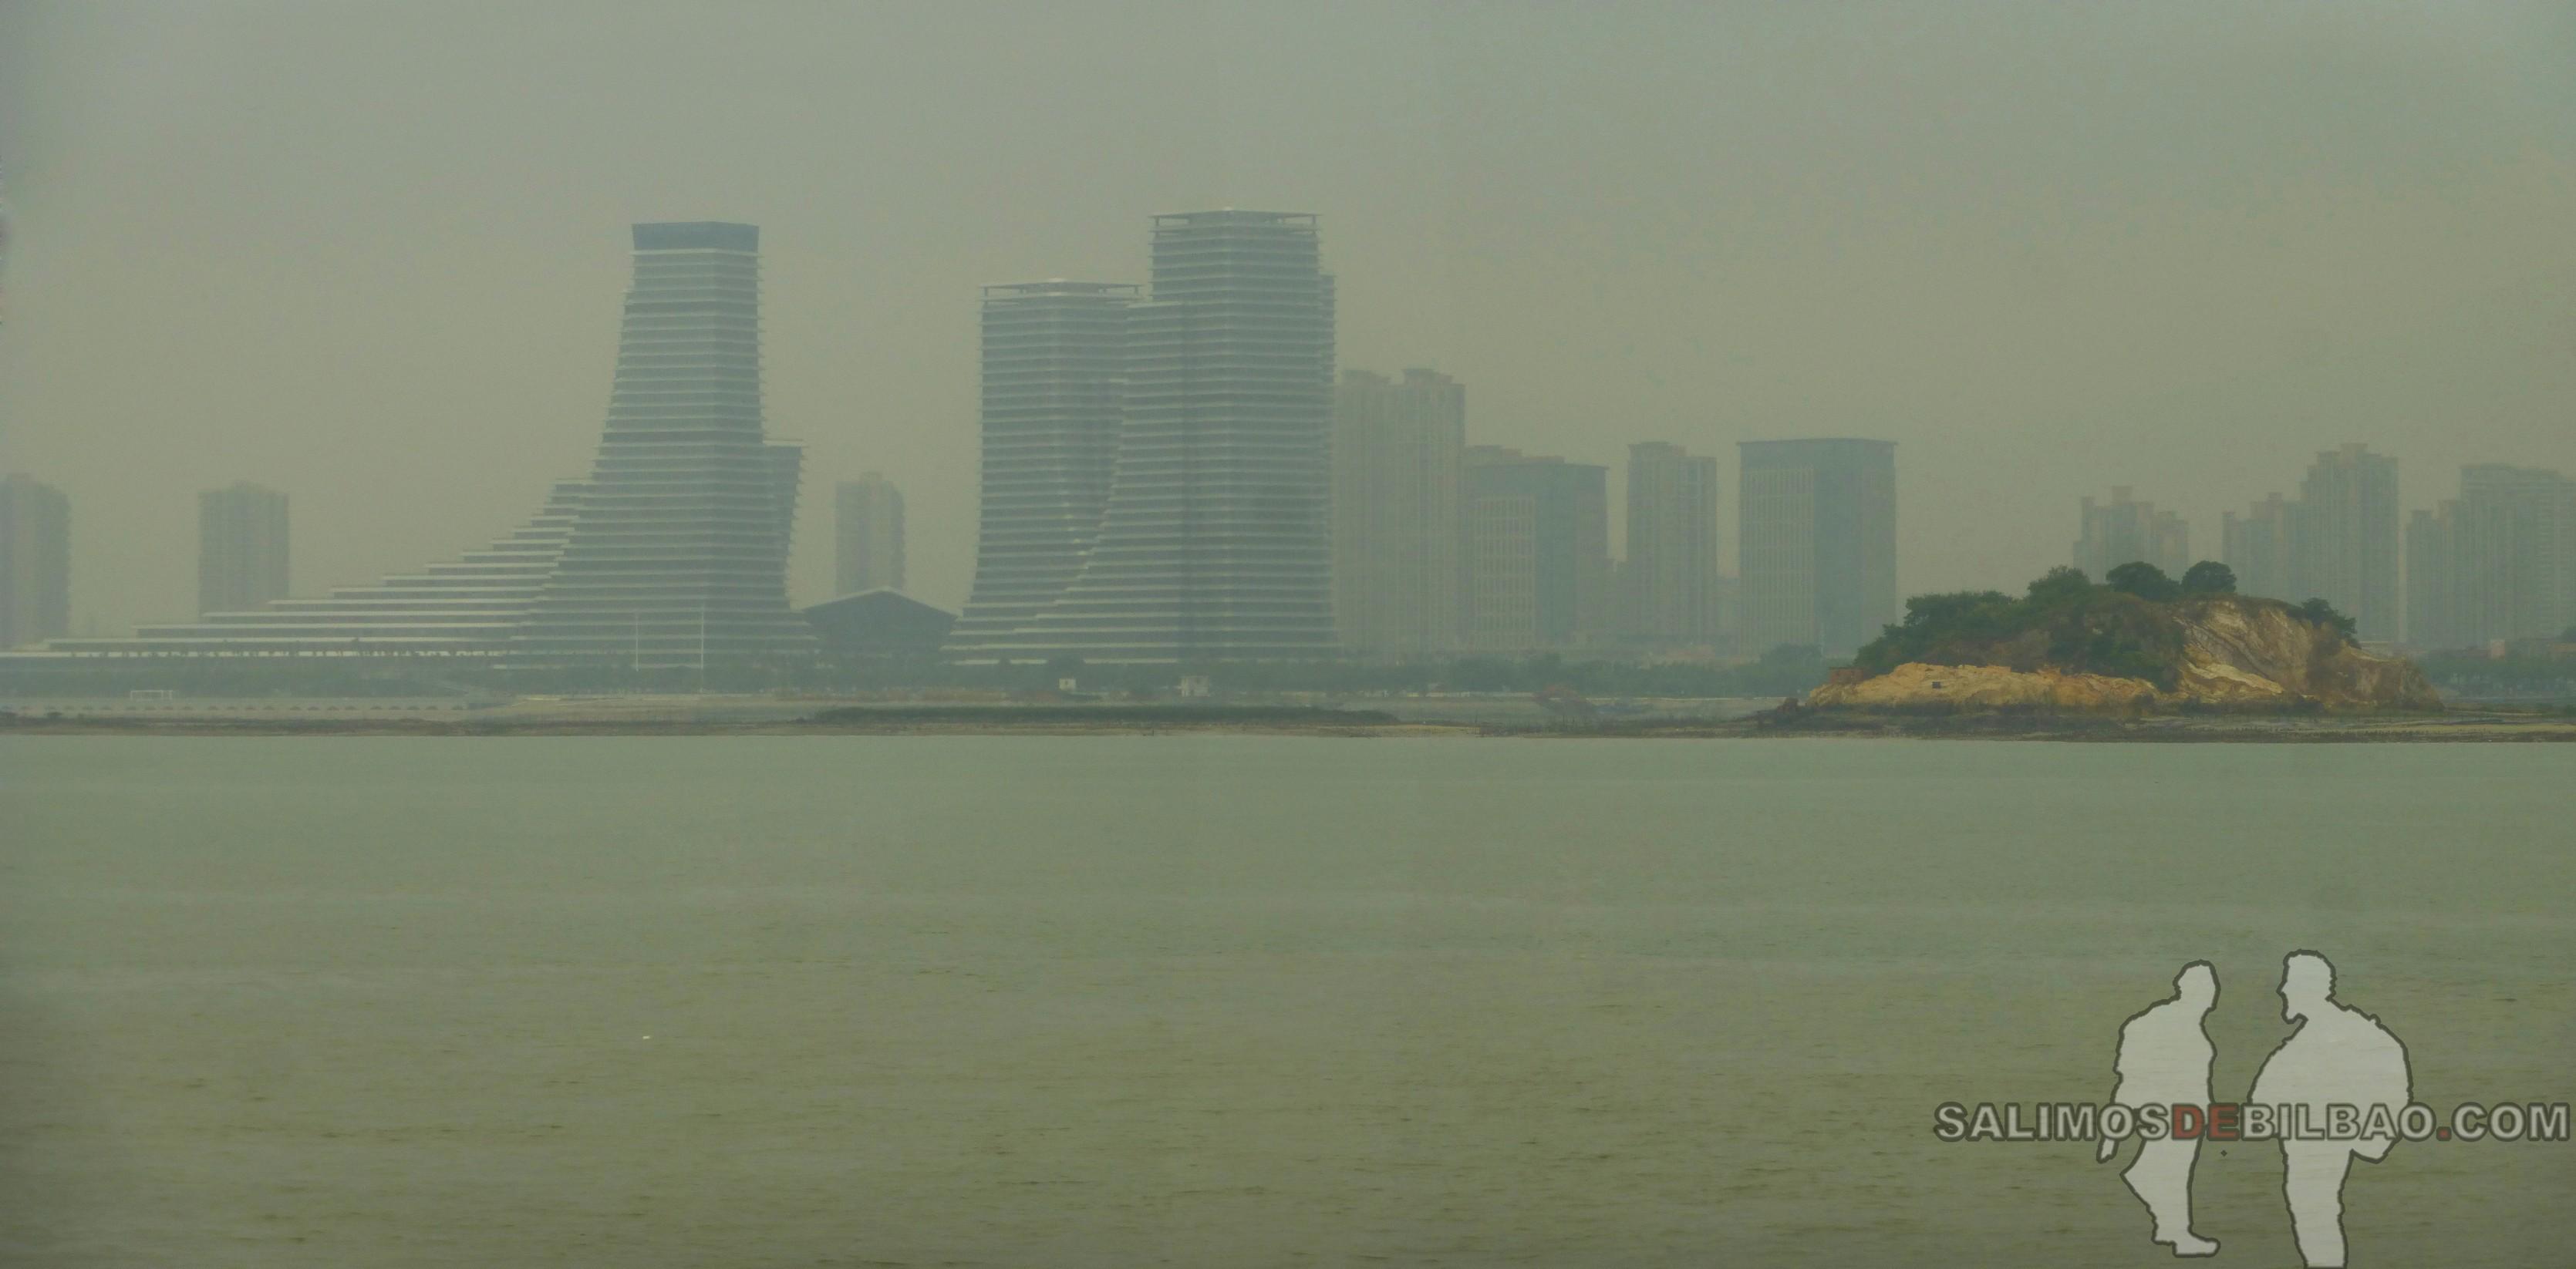 0009. Pano, Vistas de Xiamen desde el ferry a Gulangyu, Xiamen